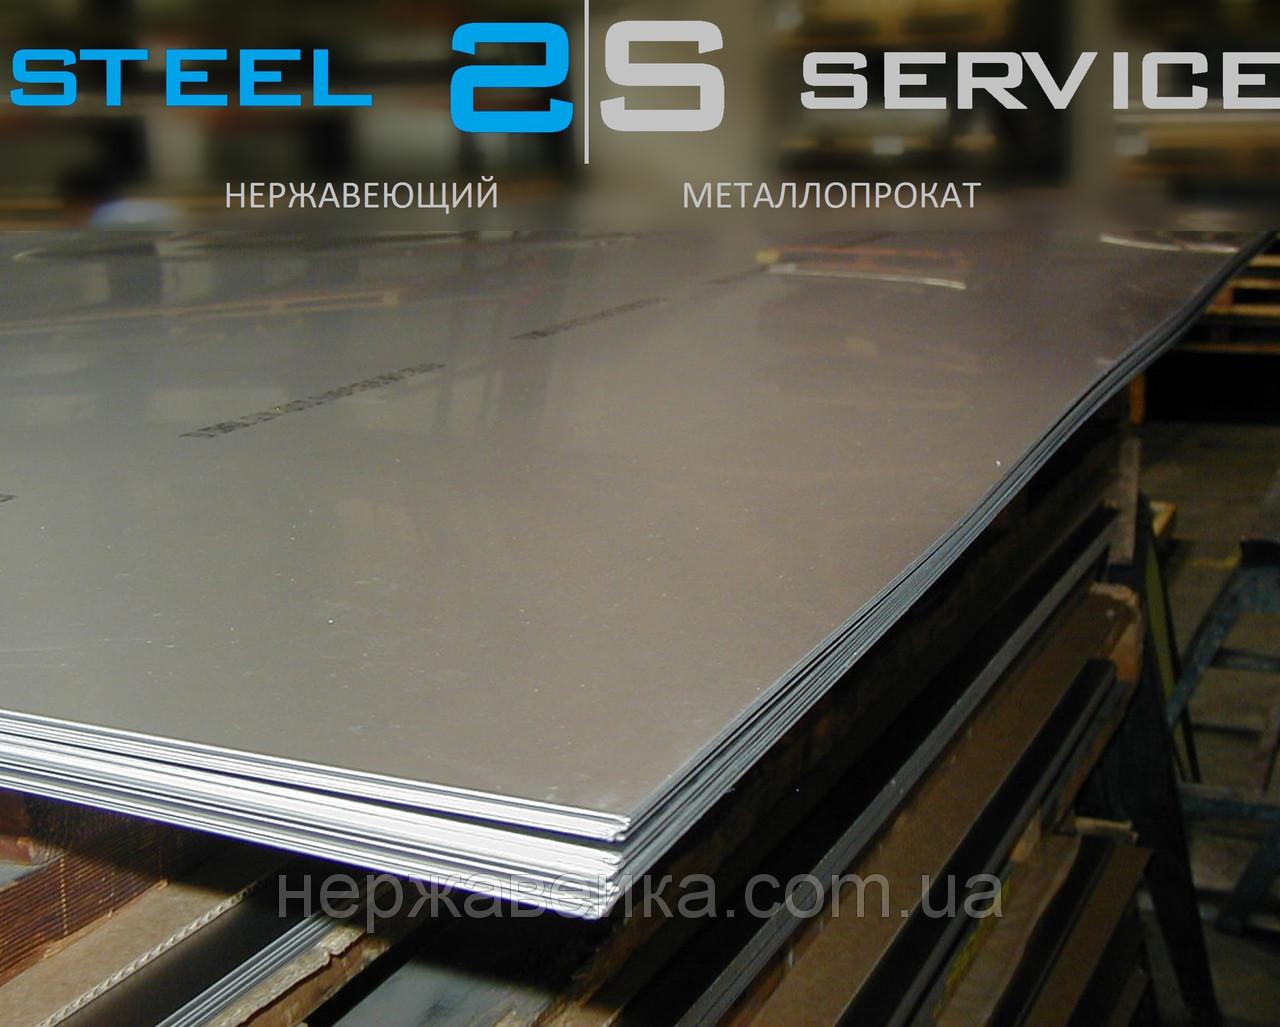 Листовая нержавейка 4х1000х2000мм AISI 430(12Х17) 2B - матовый, технический